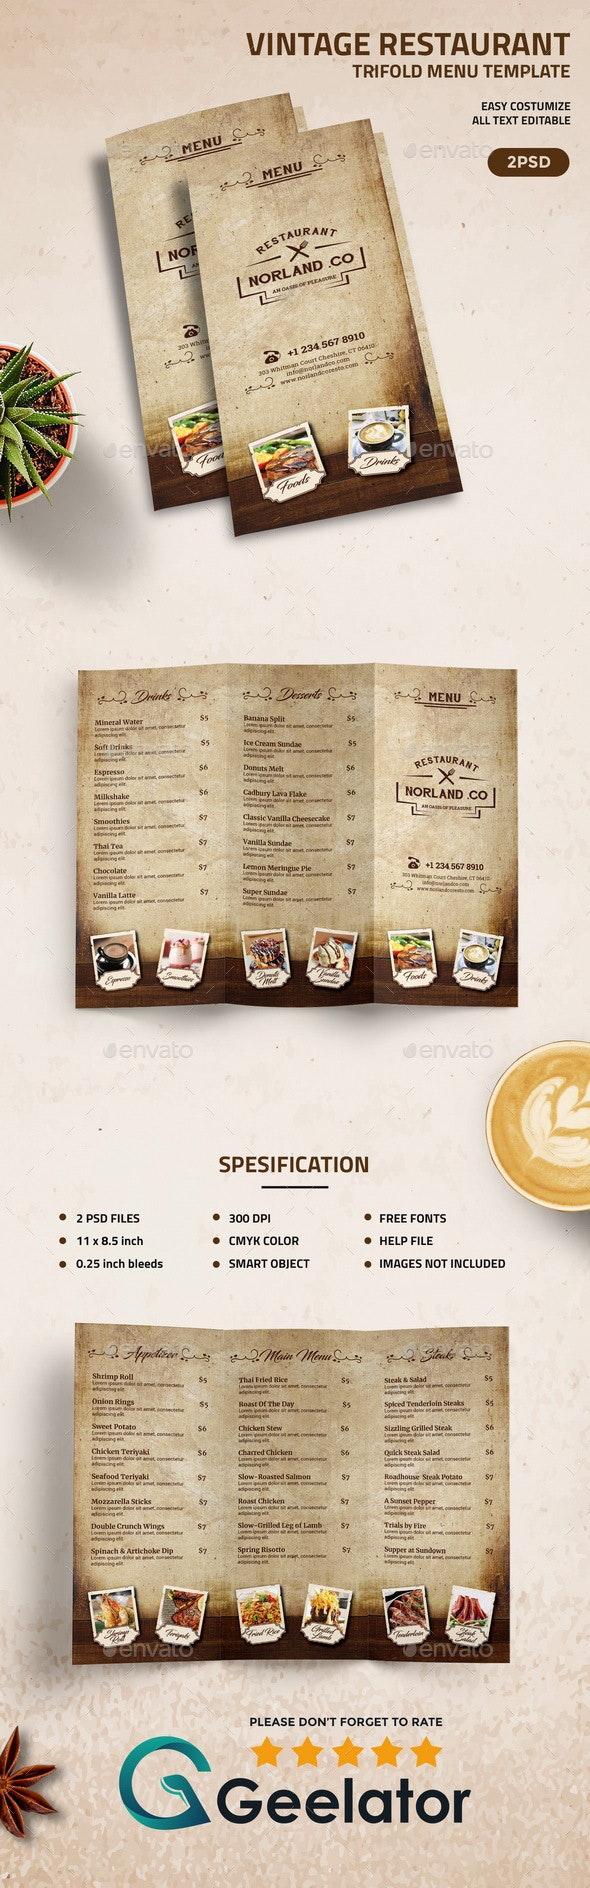 Vintage TriFold Restaurant Menu Template - Food Menus Print Templates